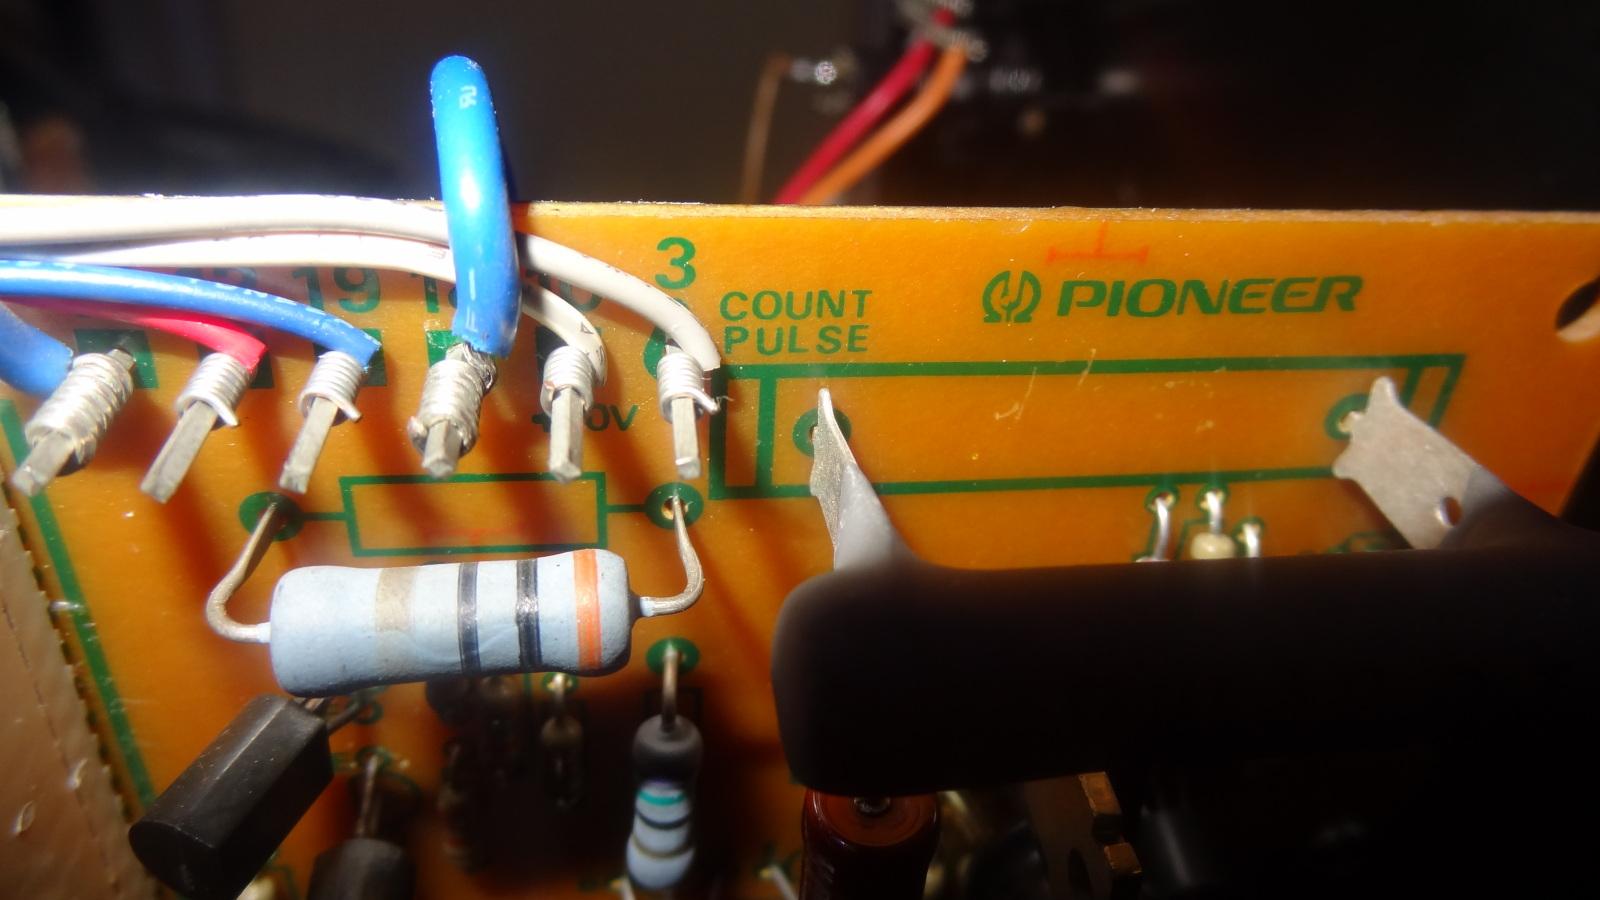 Pioneer CT-F1250 35naekm